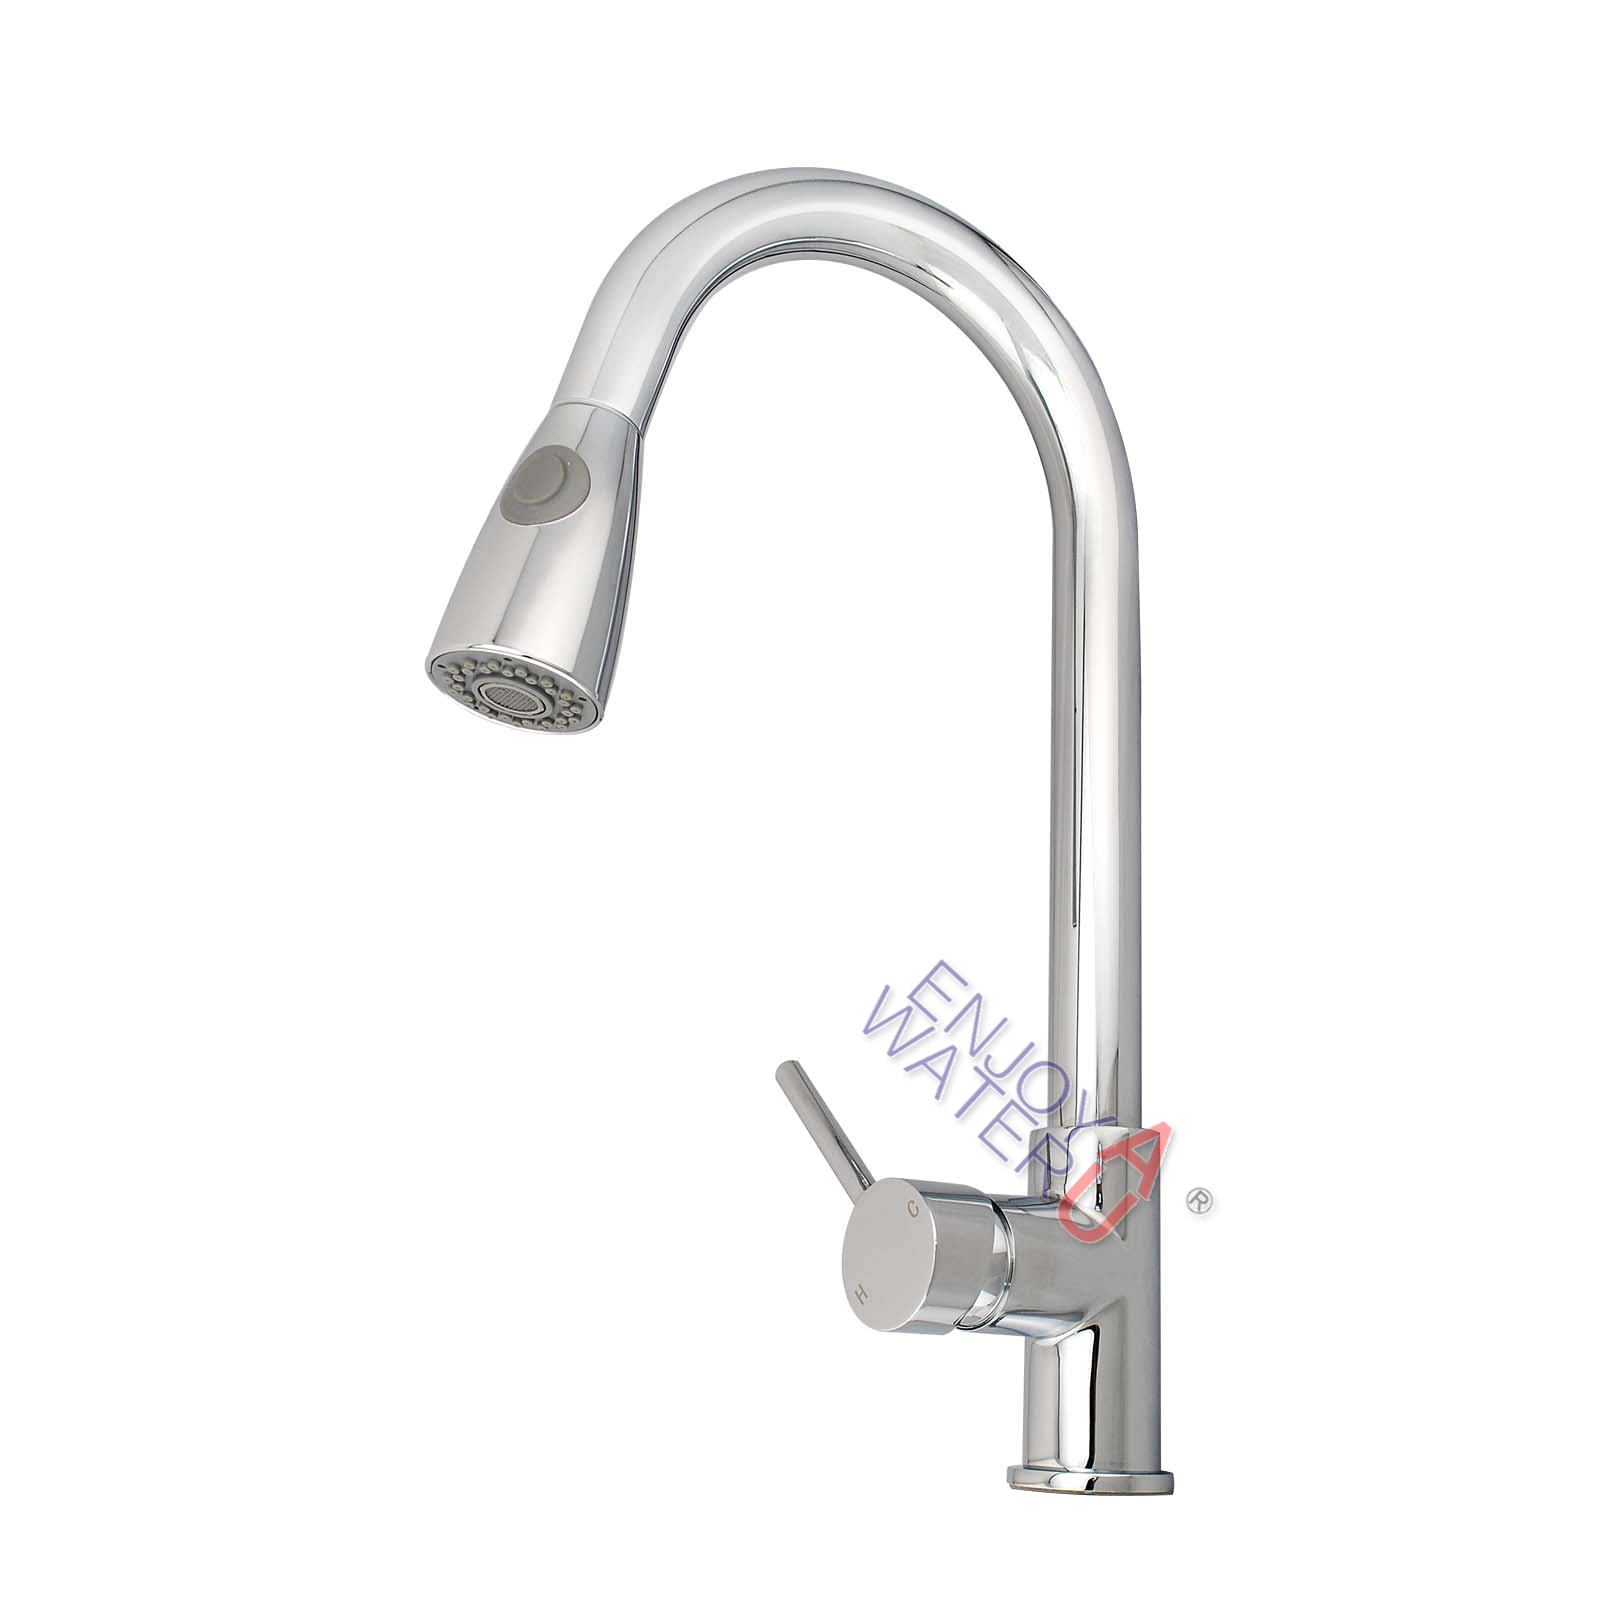 Premium 360 Swivel Pull Out Spout Kitchen Sink Basin Mixer Tap Faucet Laundry Ebay